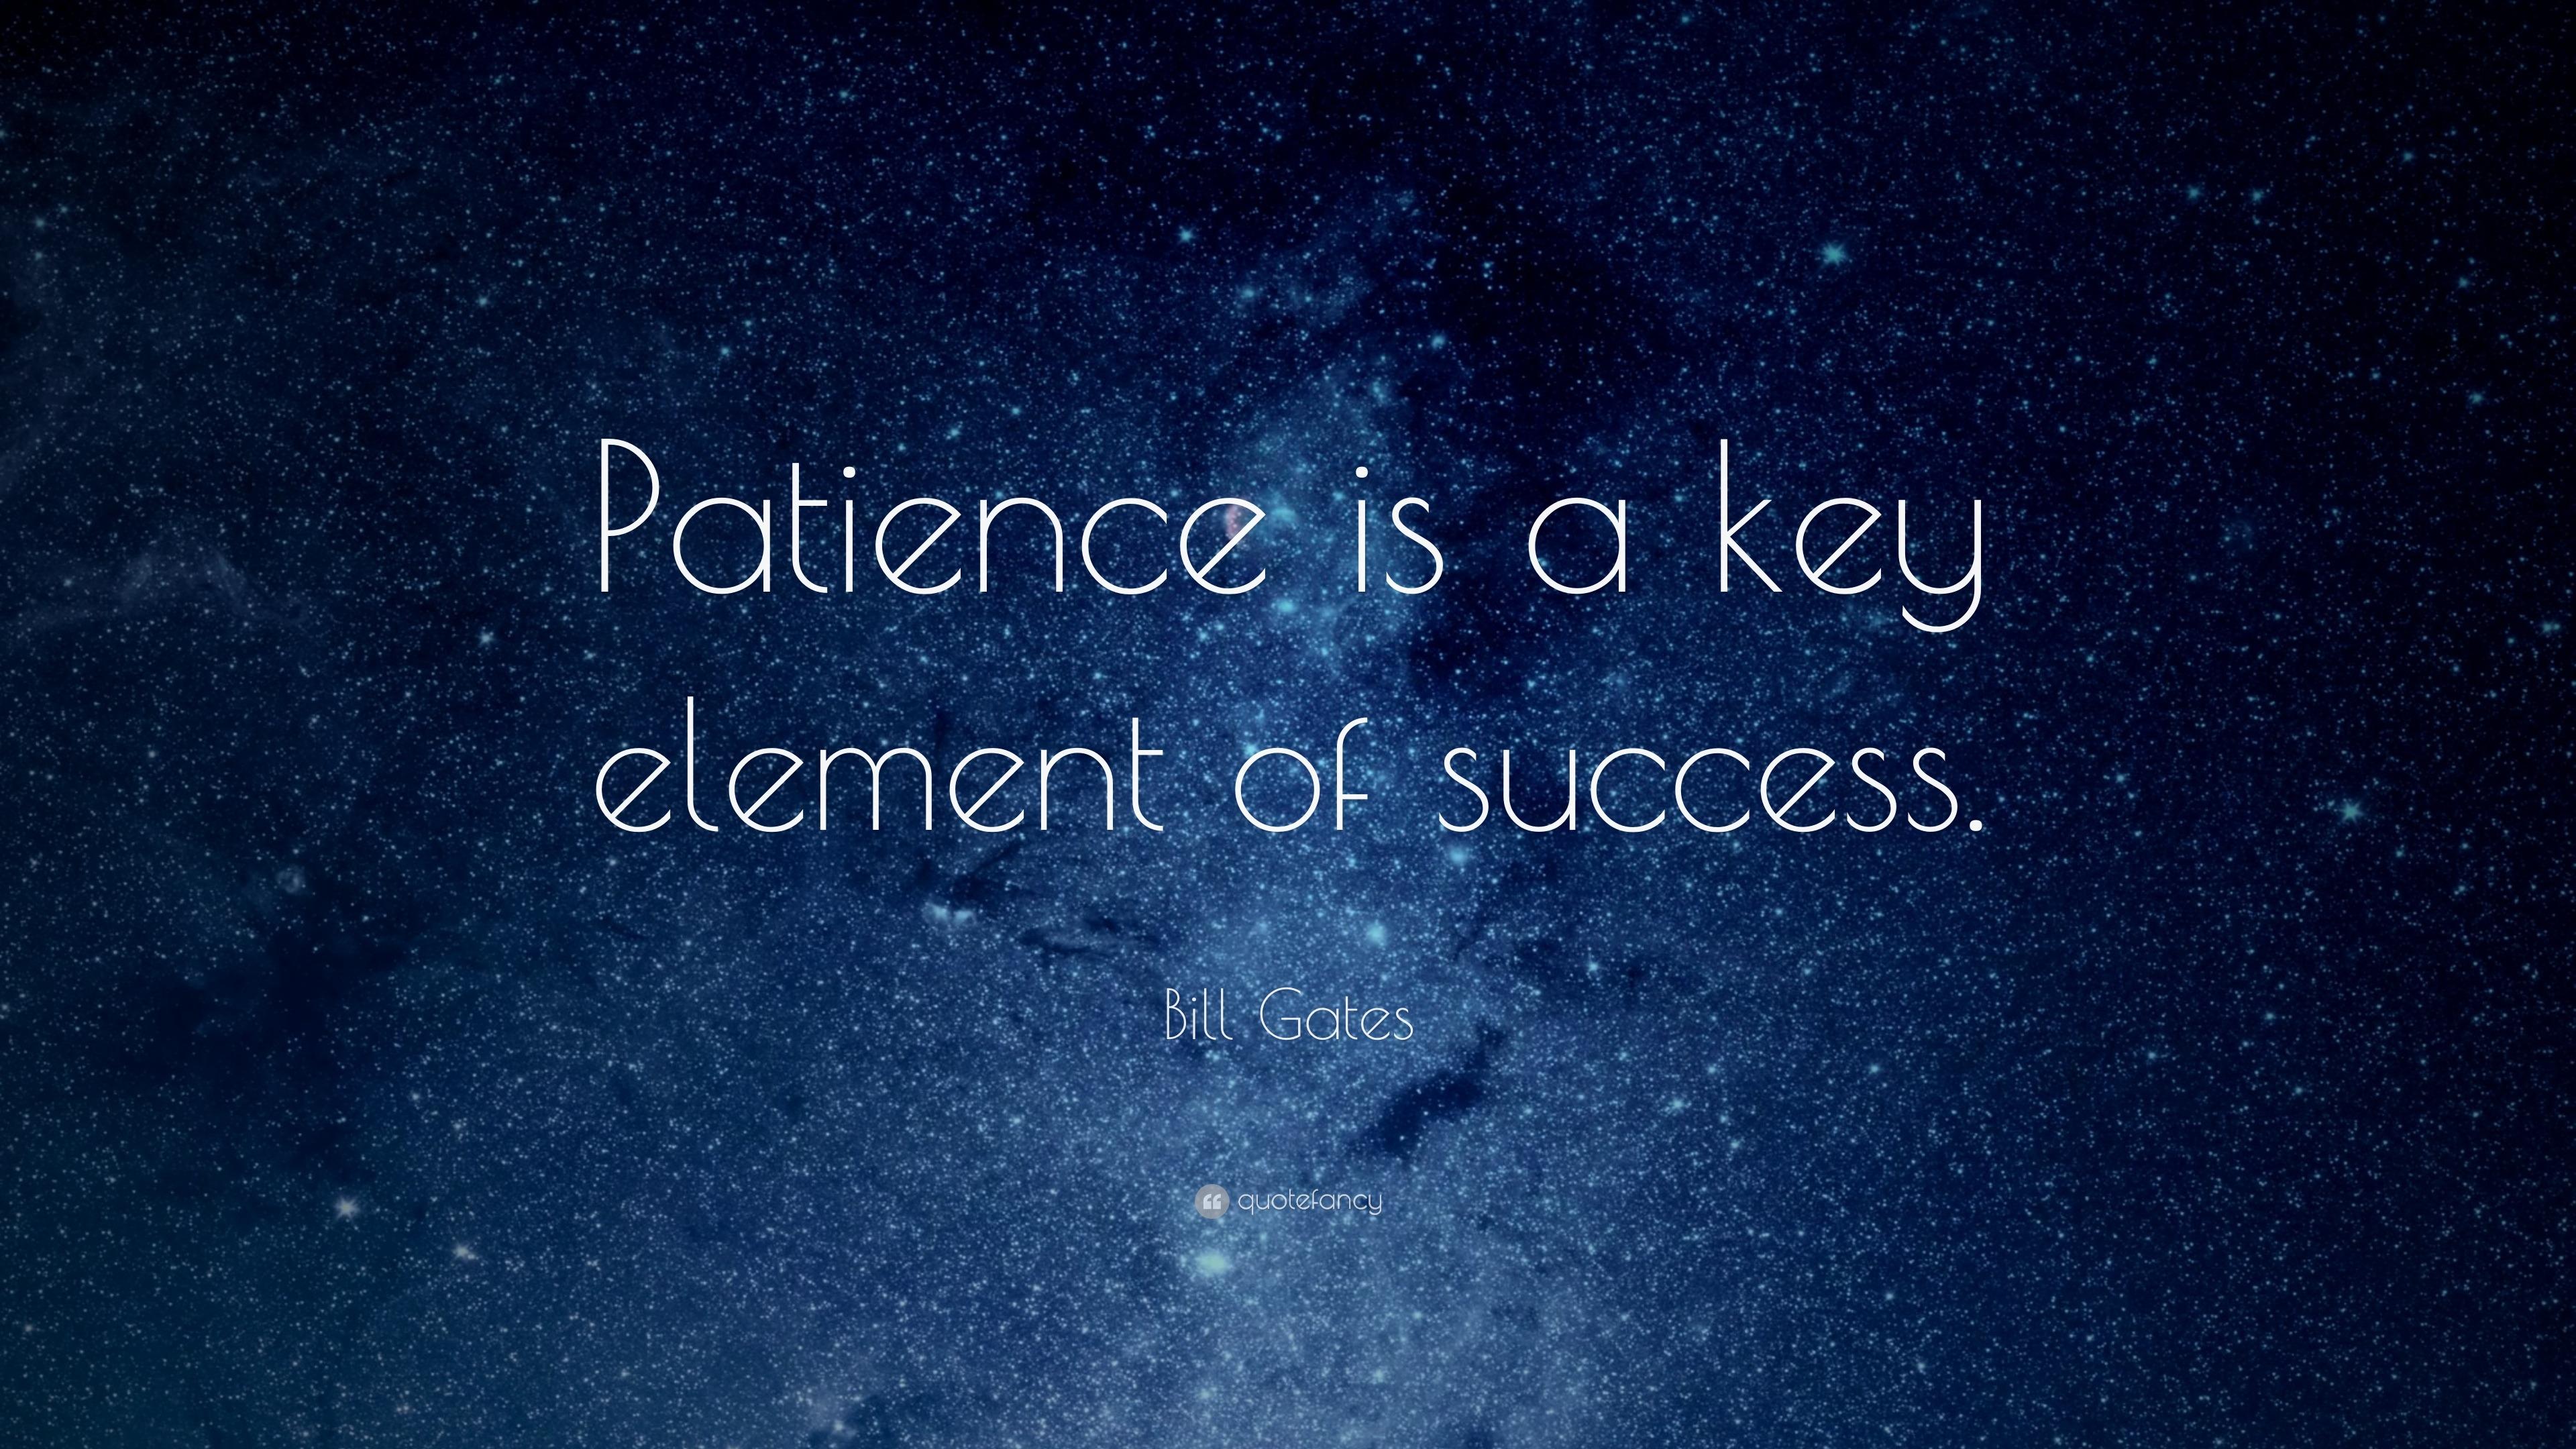 Bill Gates Quote: U201cPatience Is A Key Element Of Success.u201d